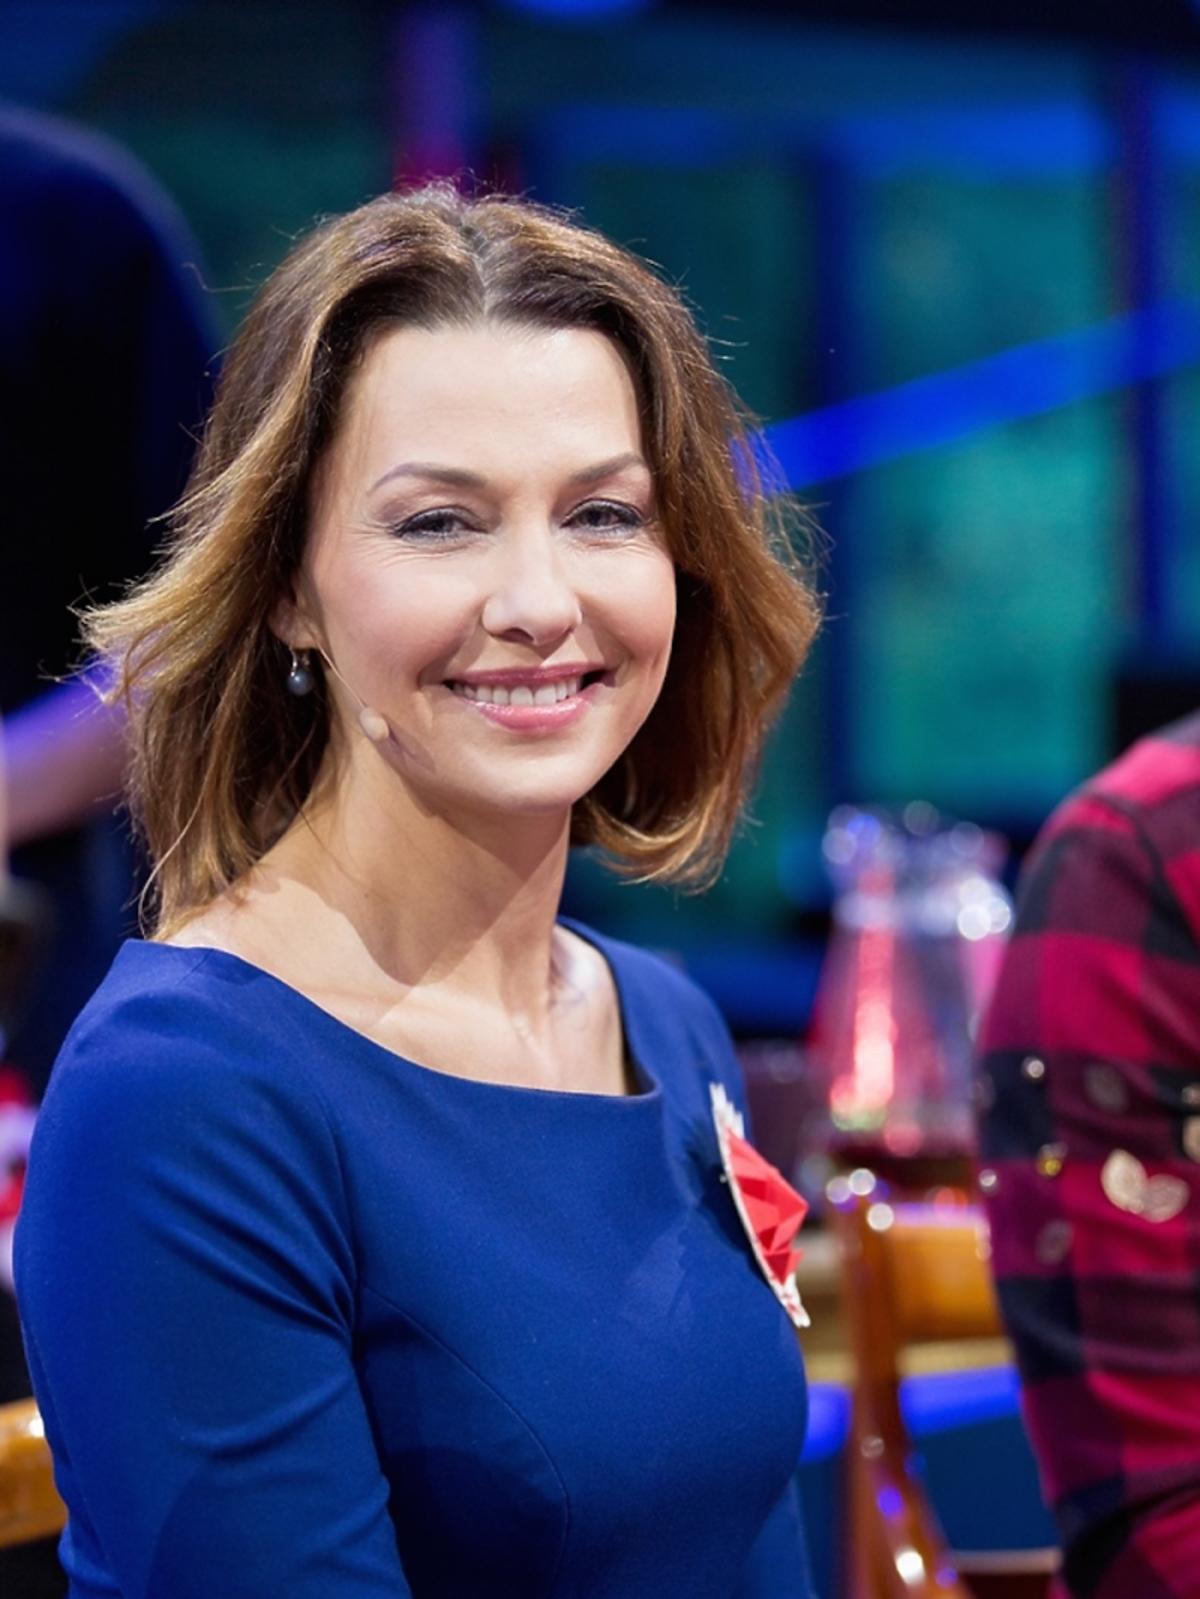 Anna Popek w granatowej bluzce